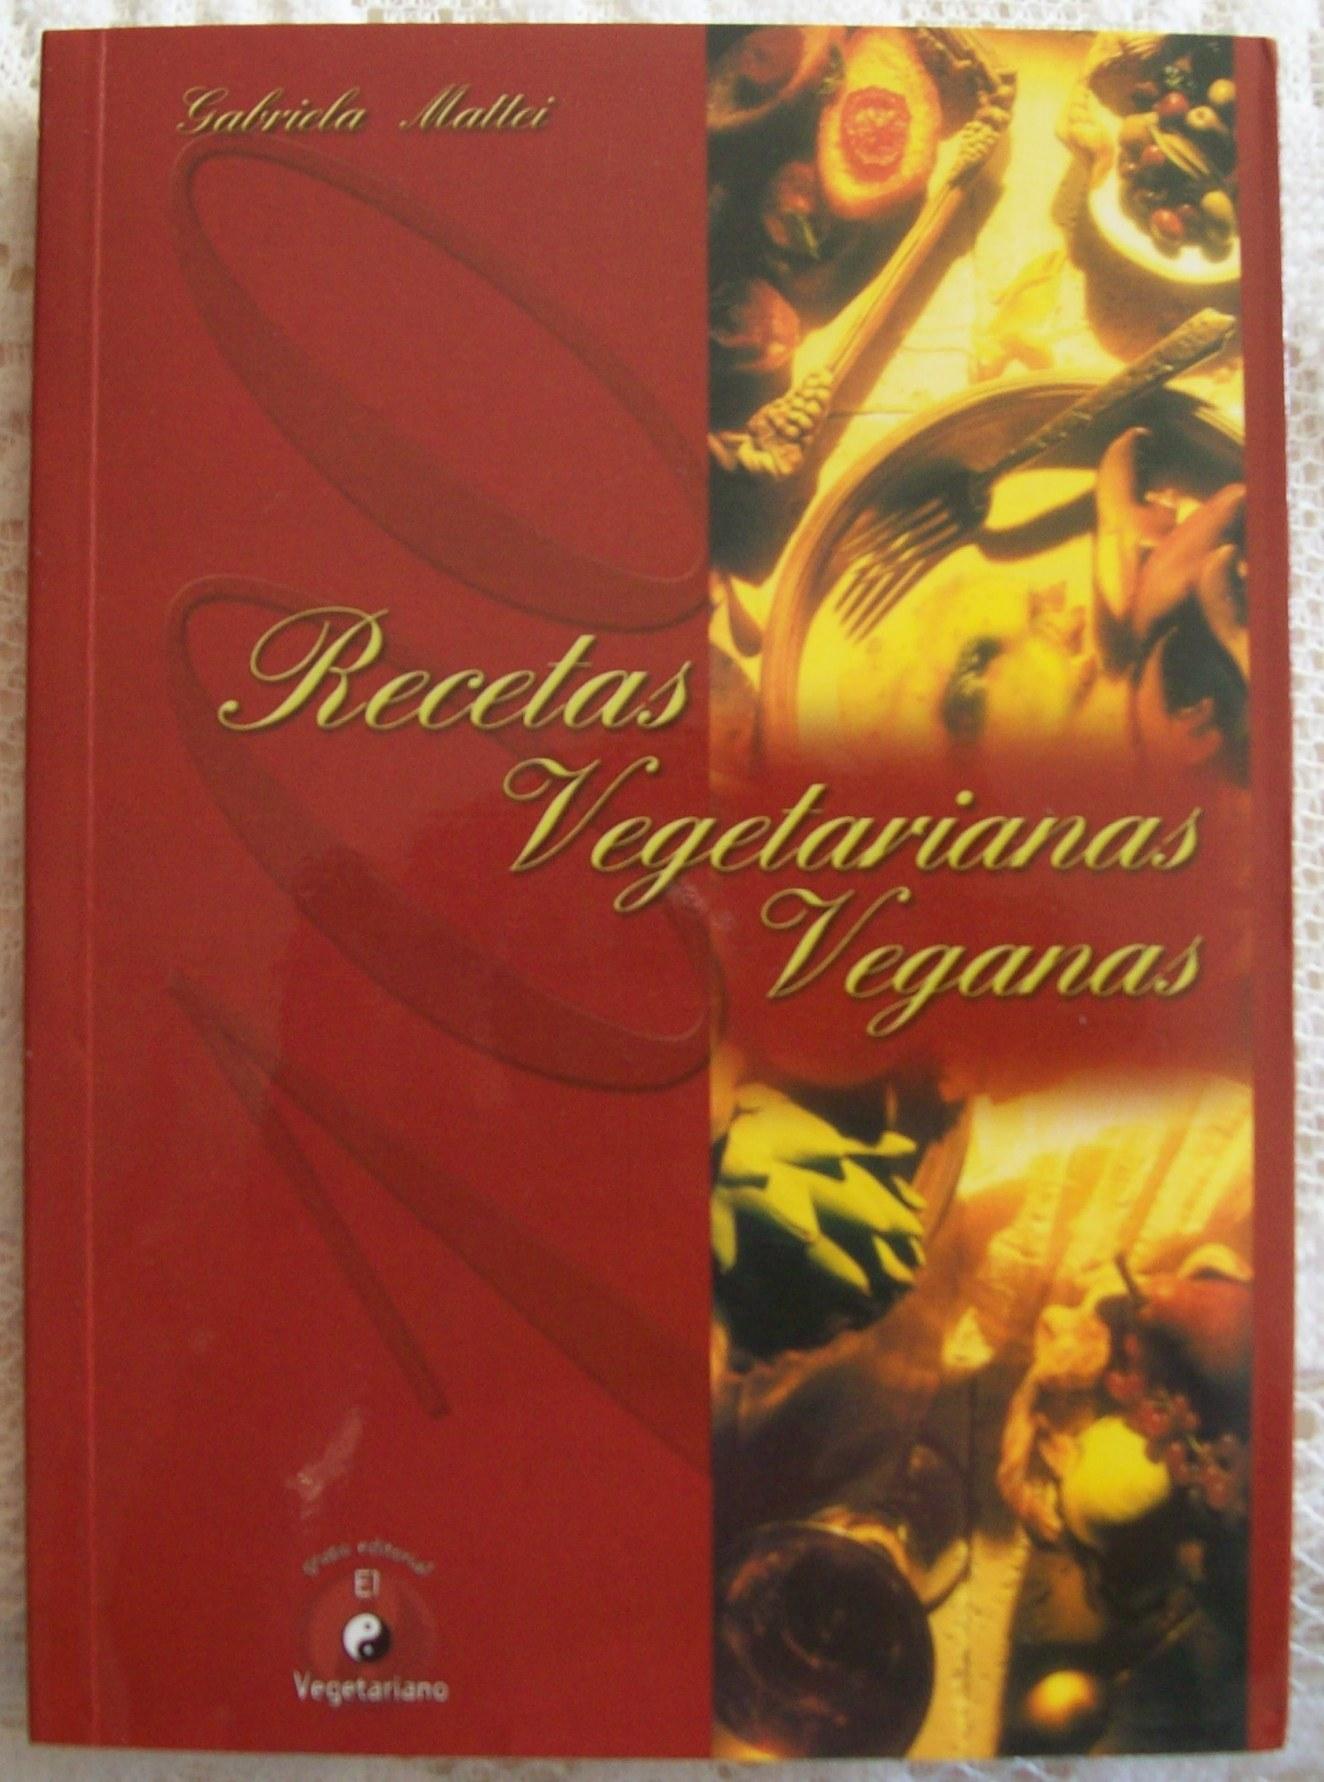 Libro cien recetas vegetarianas veganas de gabriela for Libro cocina vegetariana